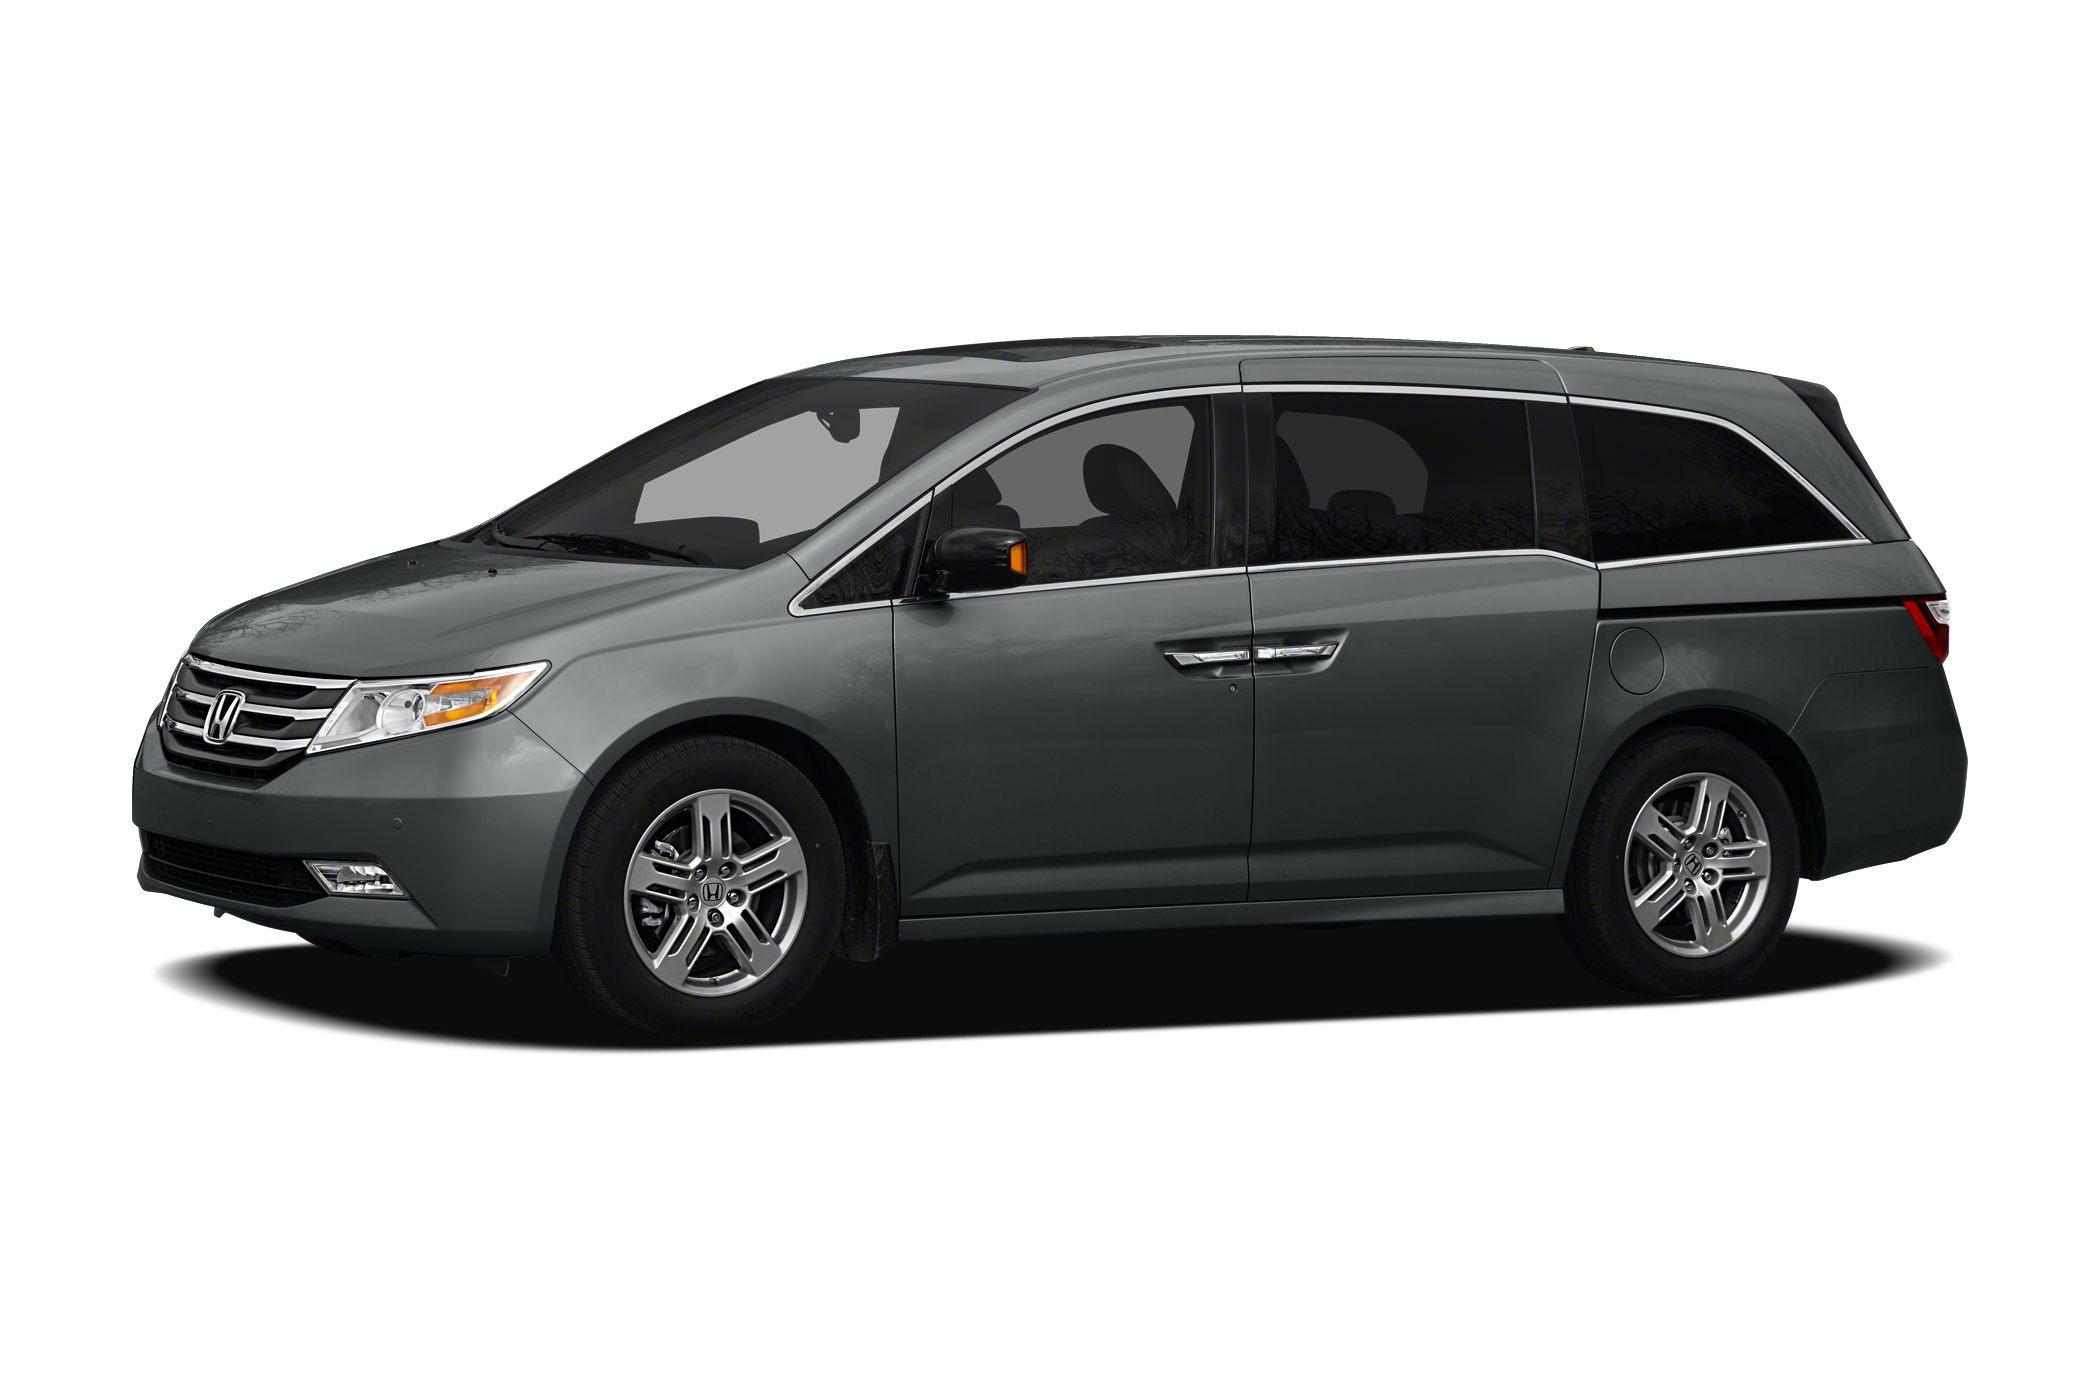 Kelebihan Honda Odyssey 2012 Murah Berkualitas